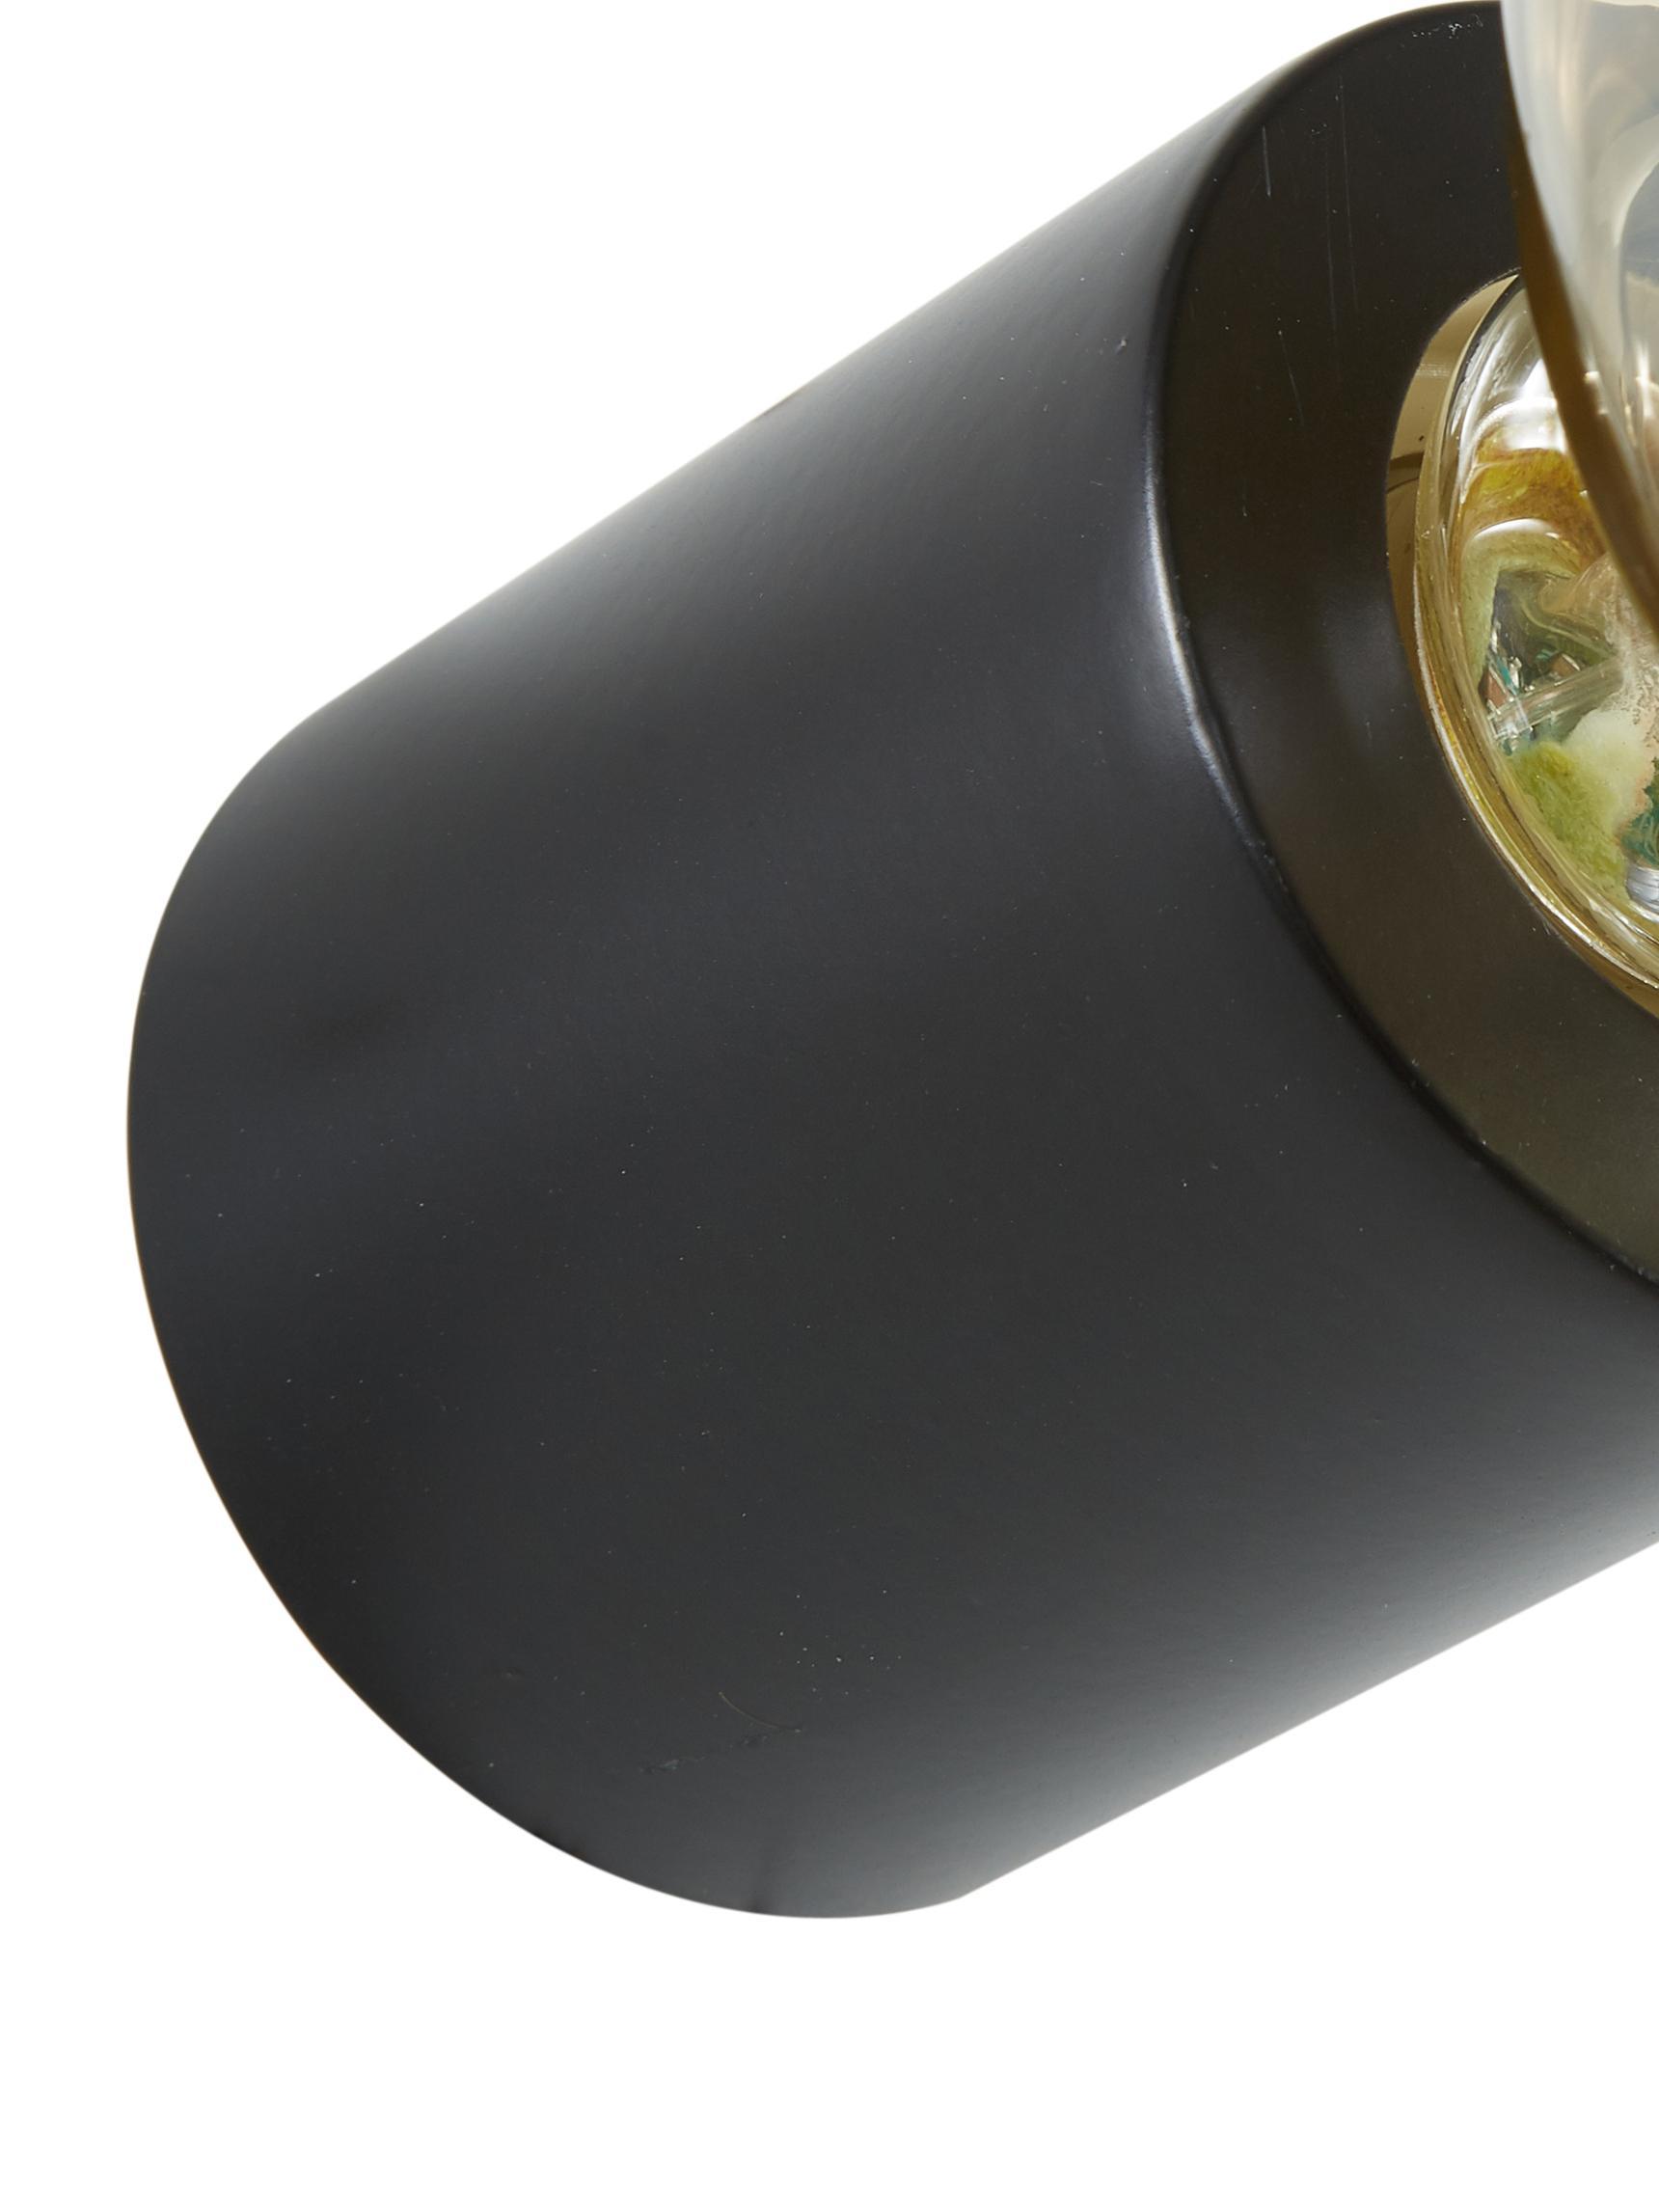 Applique en métal noir Chanty, Noir, mat